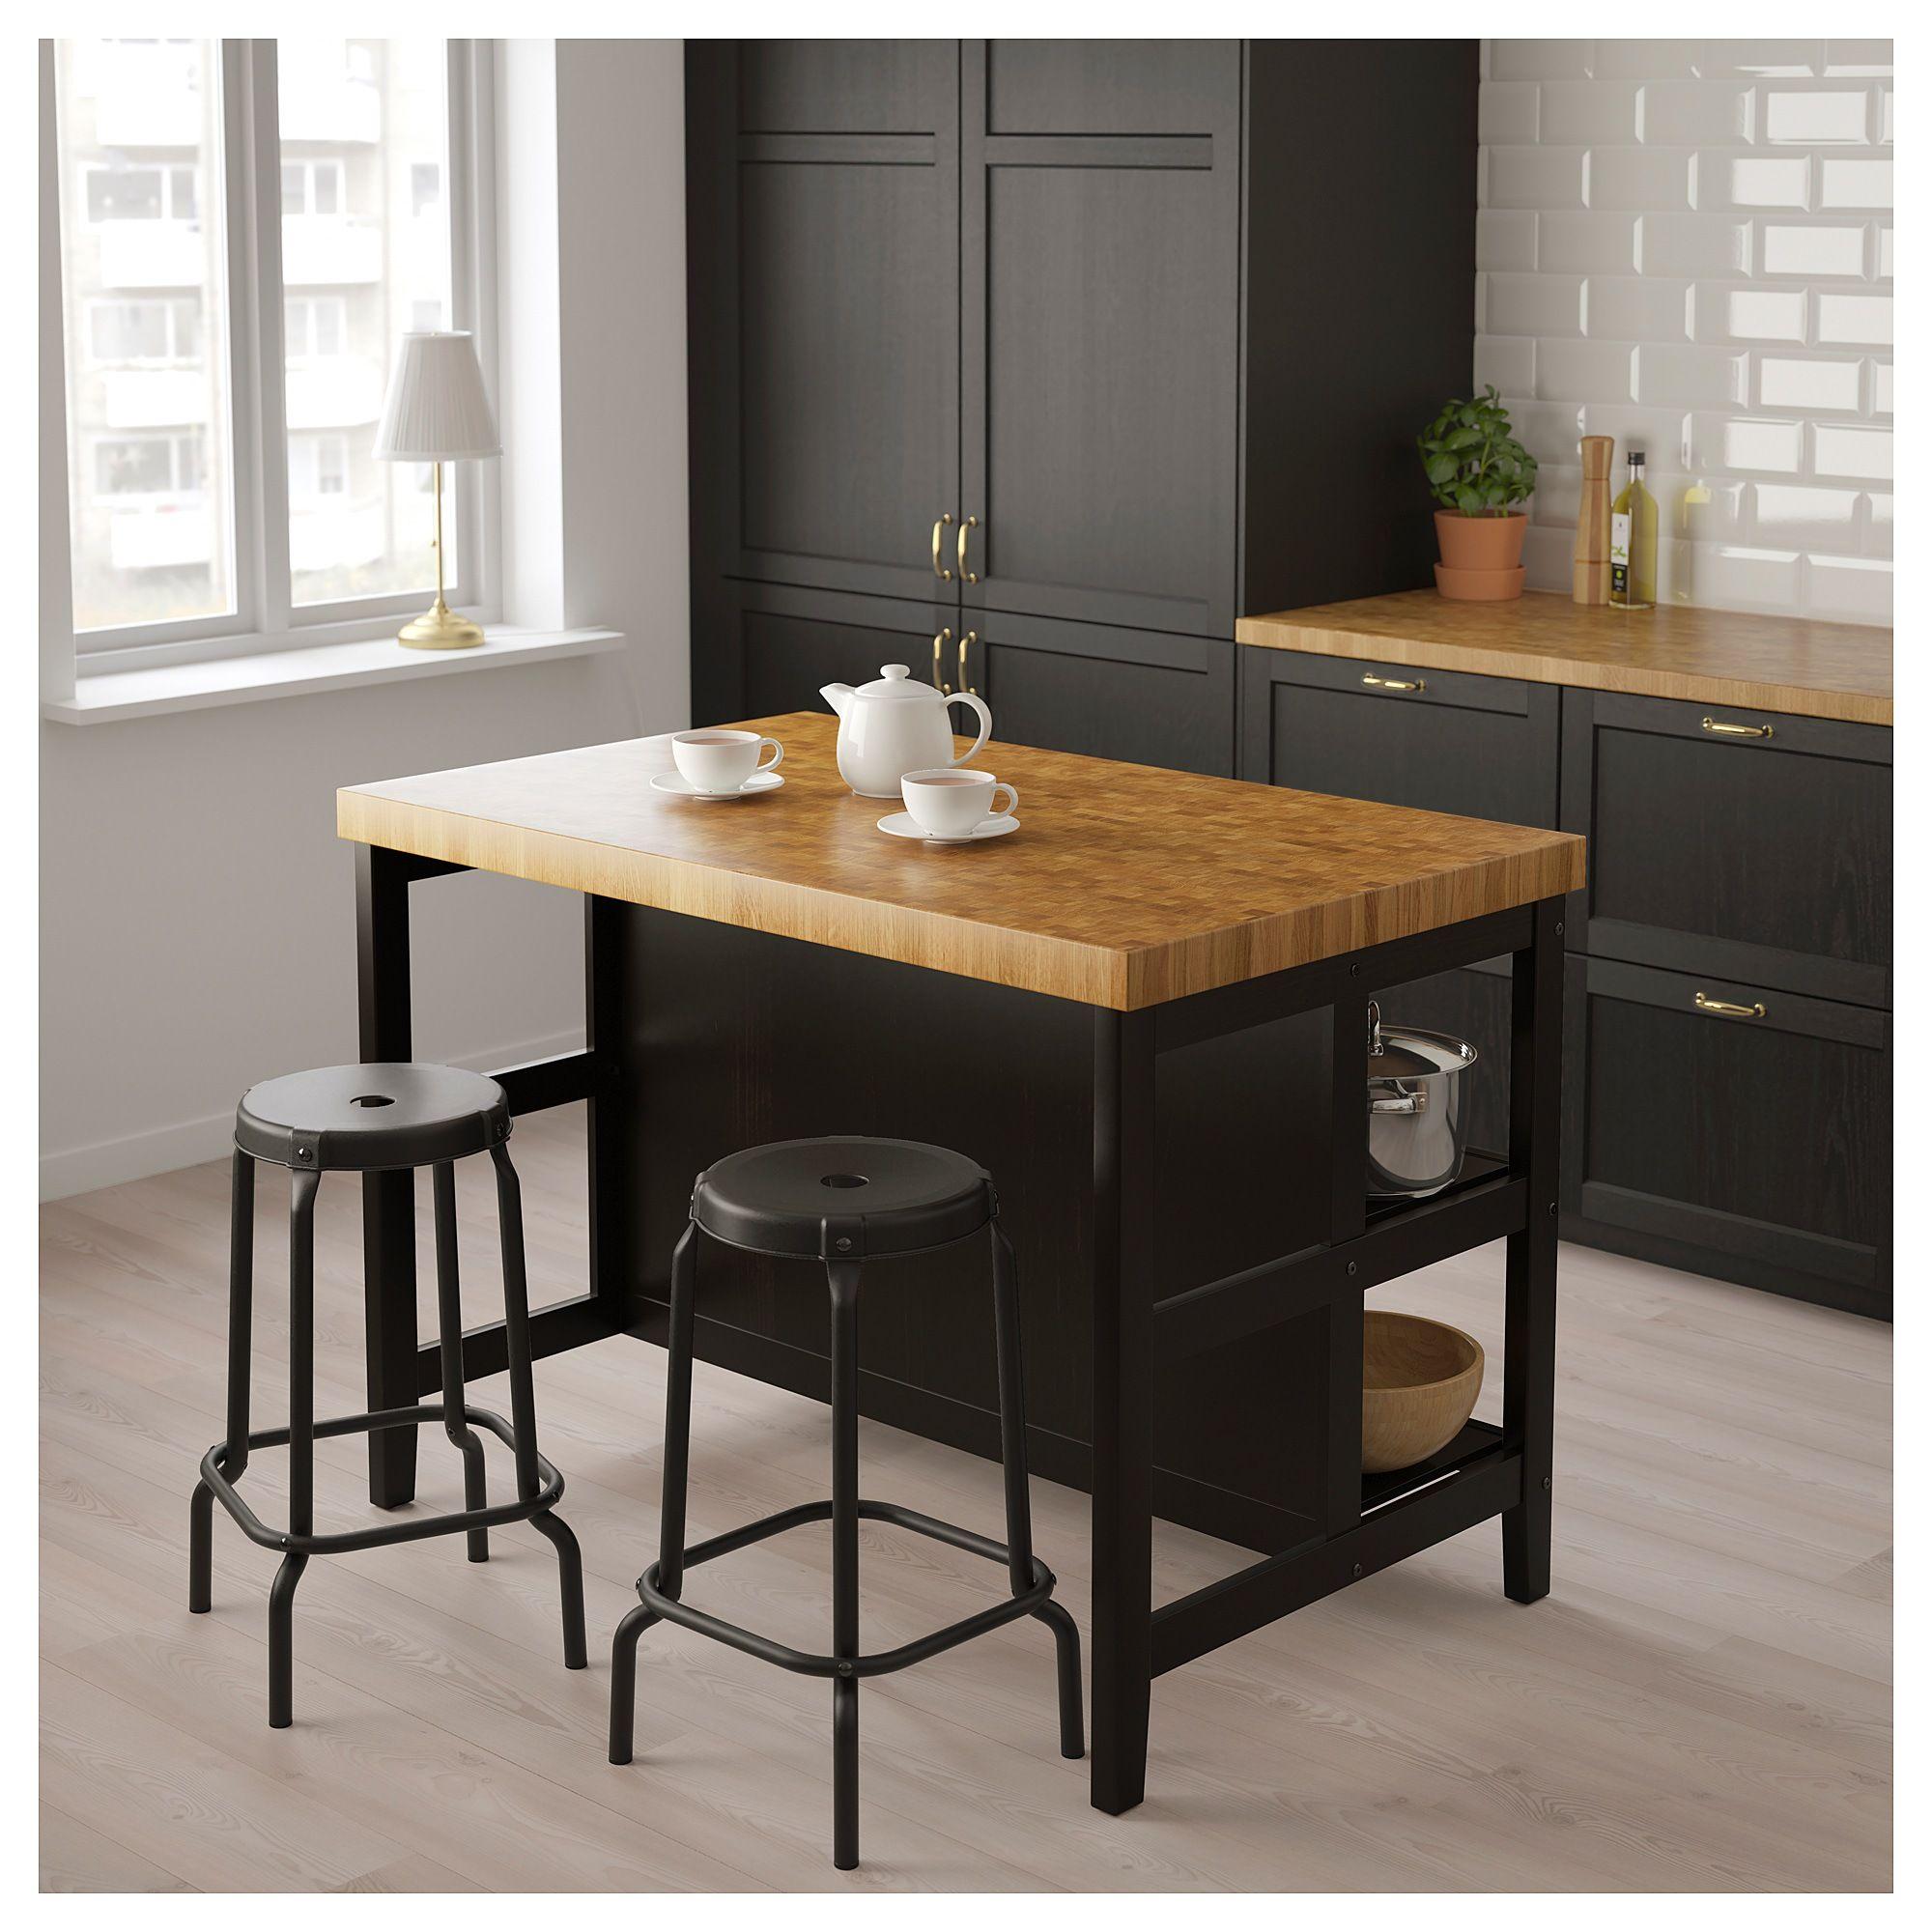 VADHOLMA Kjøkkenøy, svart, eik | Kitchen | Pinterest